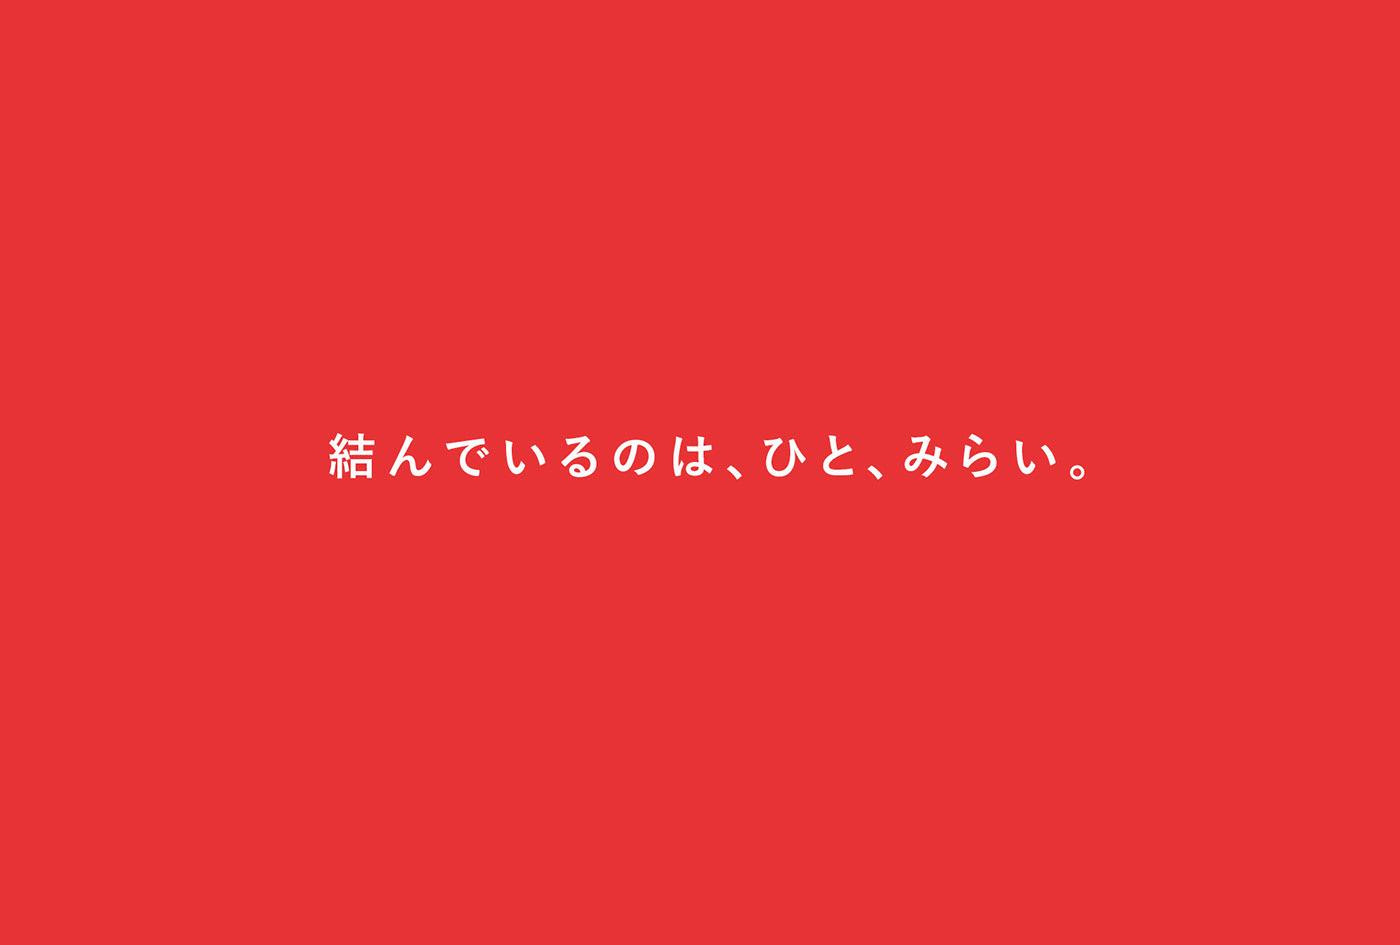 Chinese Character CI company logo kanji red VI 企業ロゴ 漢字